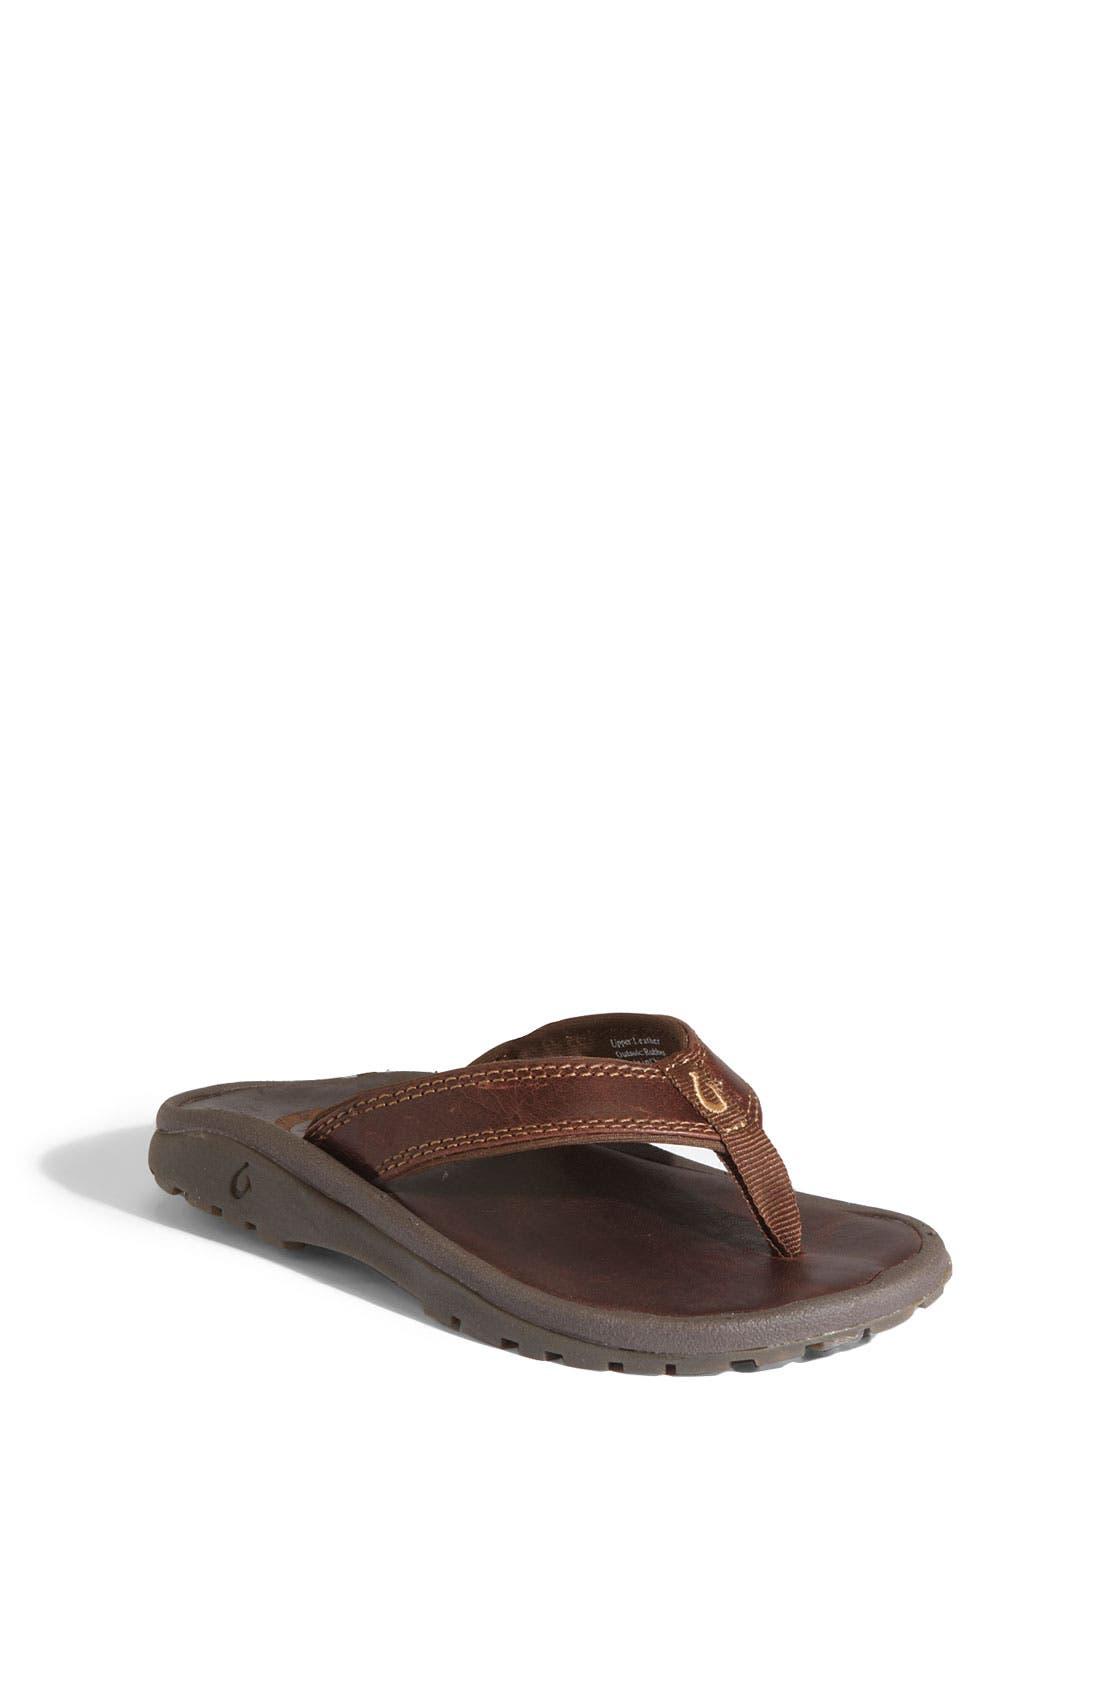 Main Image - OluKai 'Ohana' Leather Sandal (Toddler, Little Kid & Big Kid)